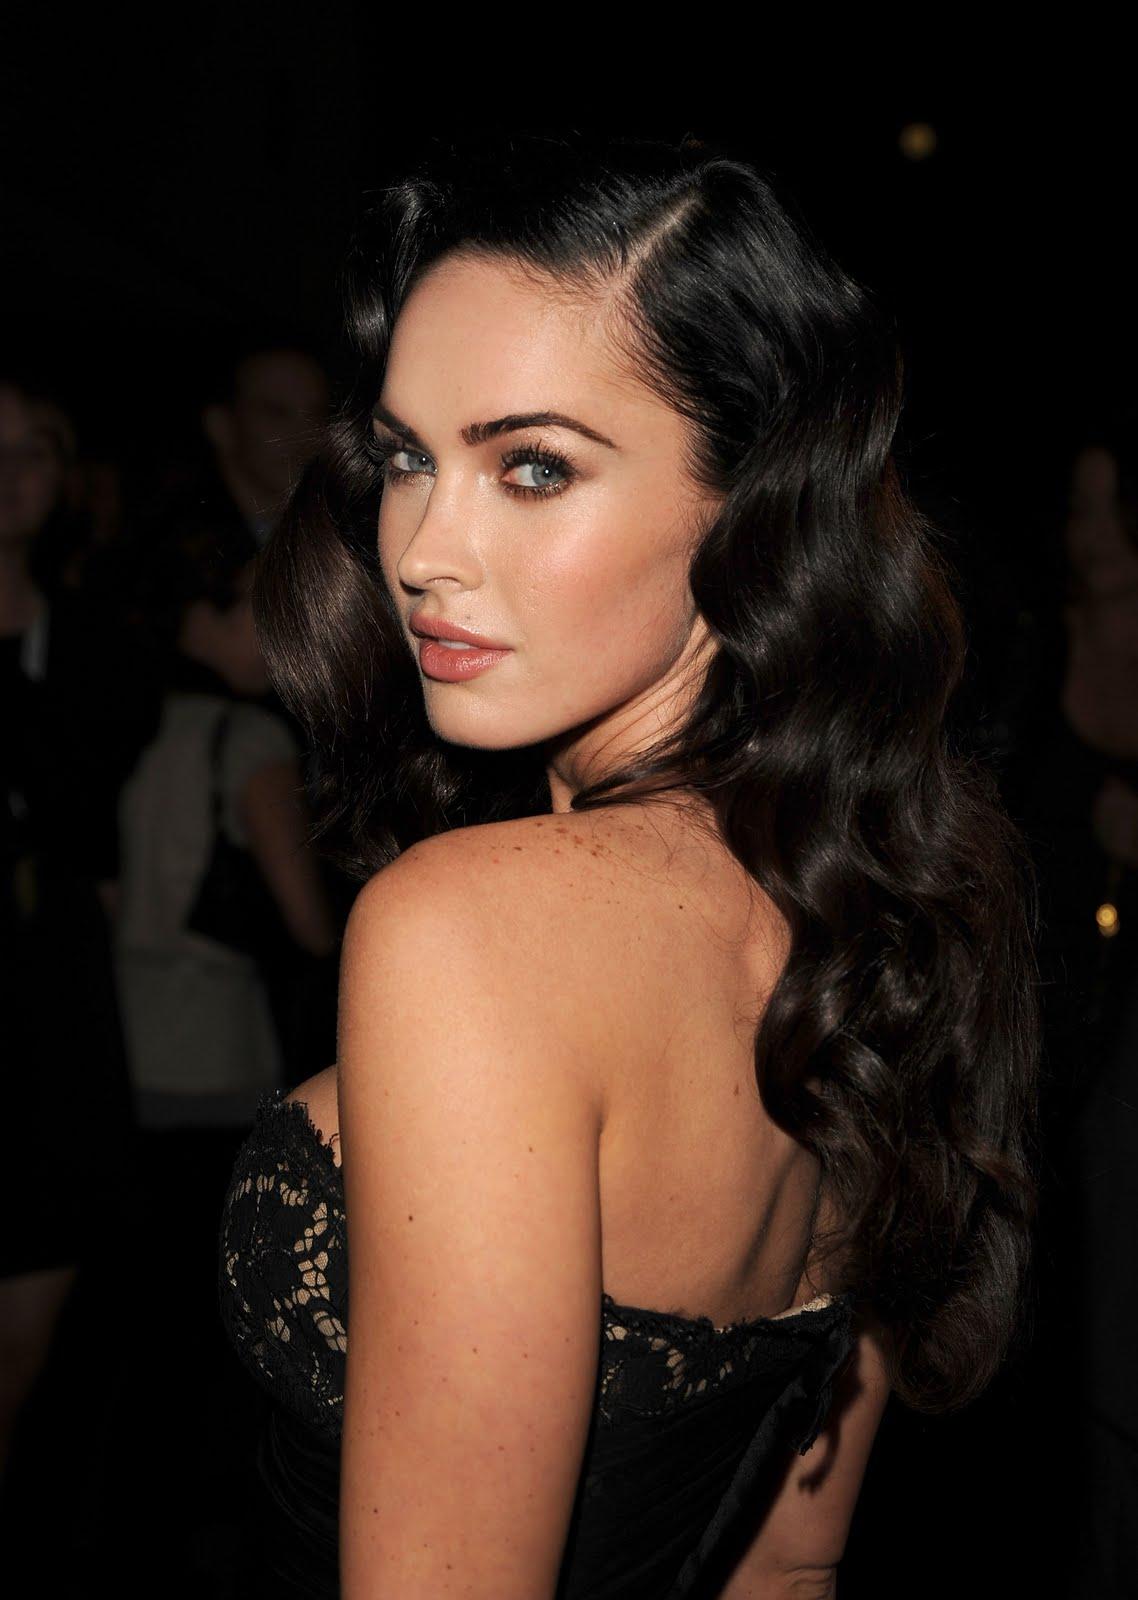 Megan Fox Special Pictures 4 Film Actresses